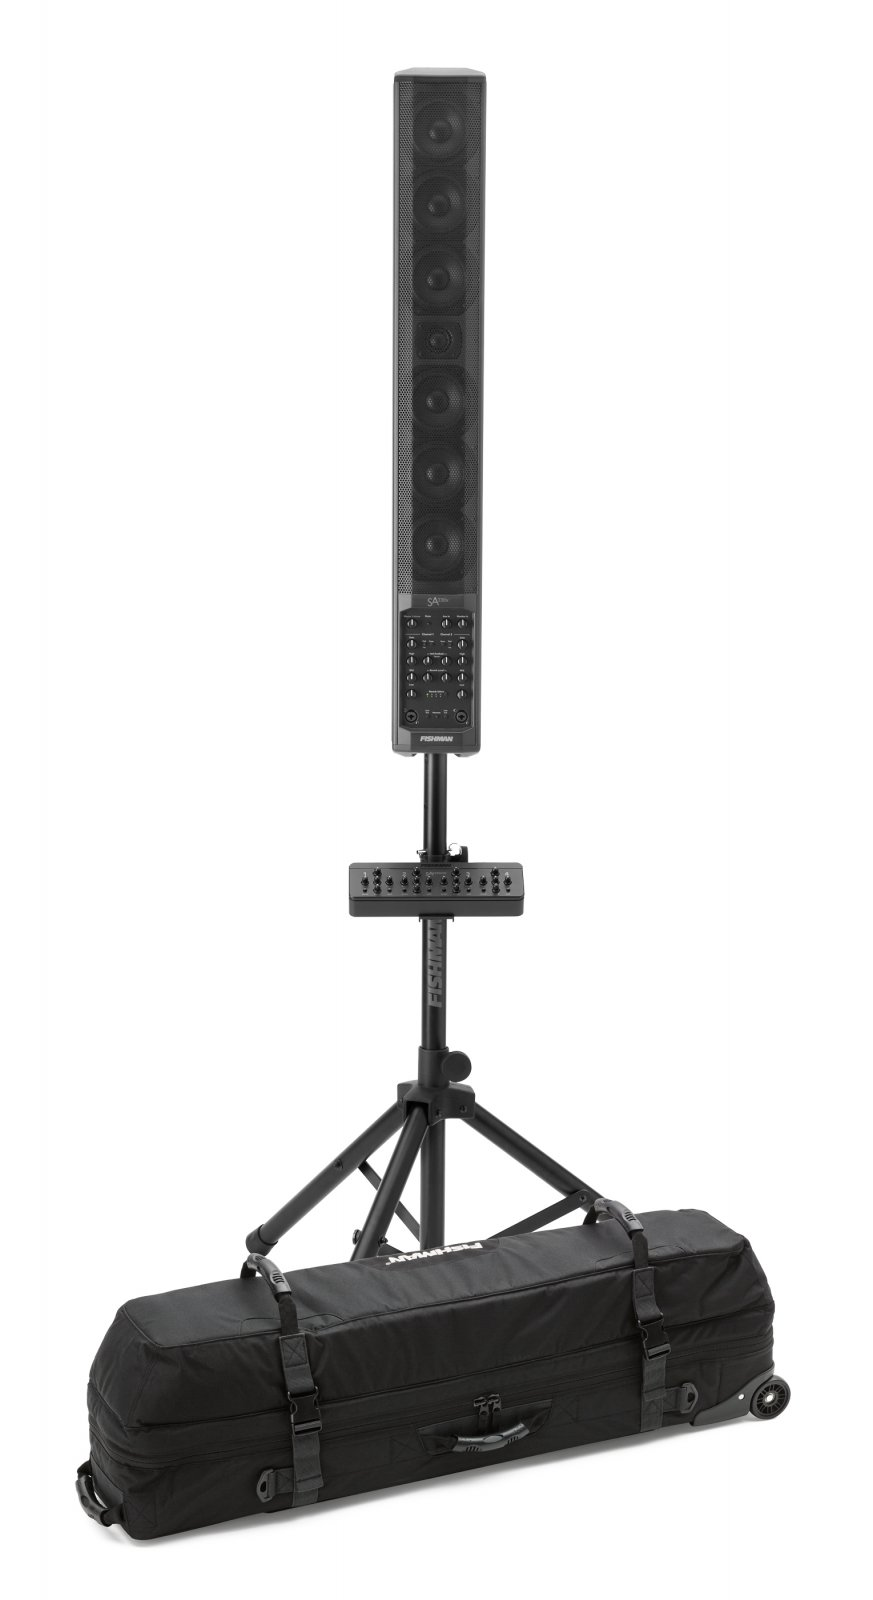 SA330x Bundle (Includes SA330x Expand Mixer and Deluxe Carry Bag)